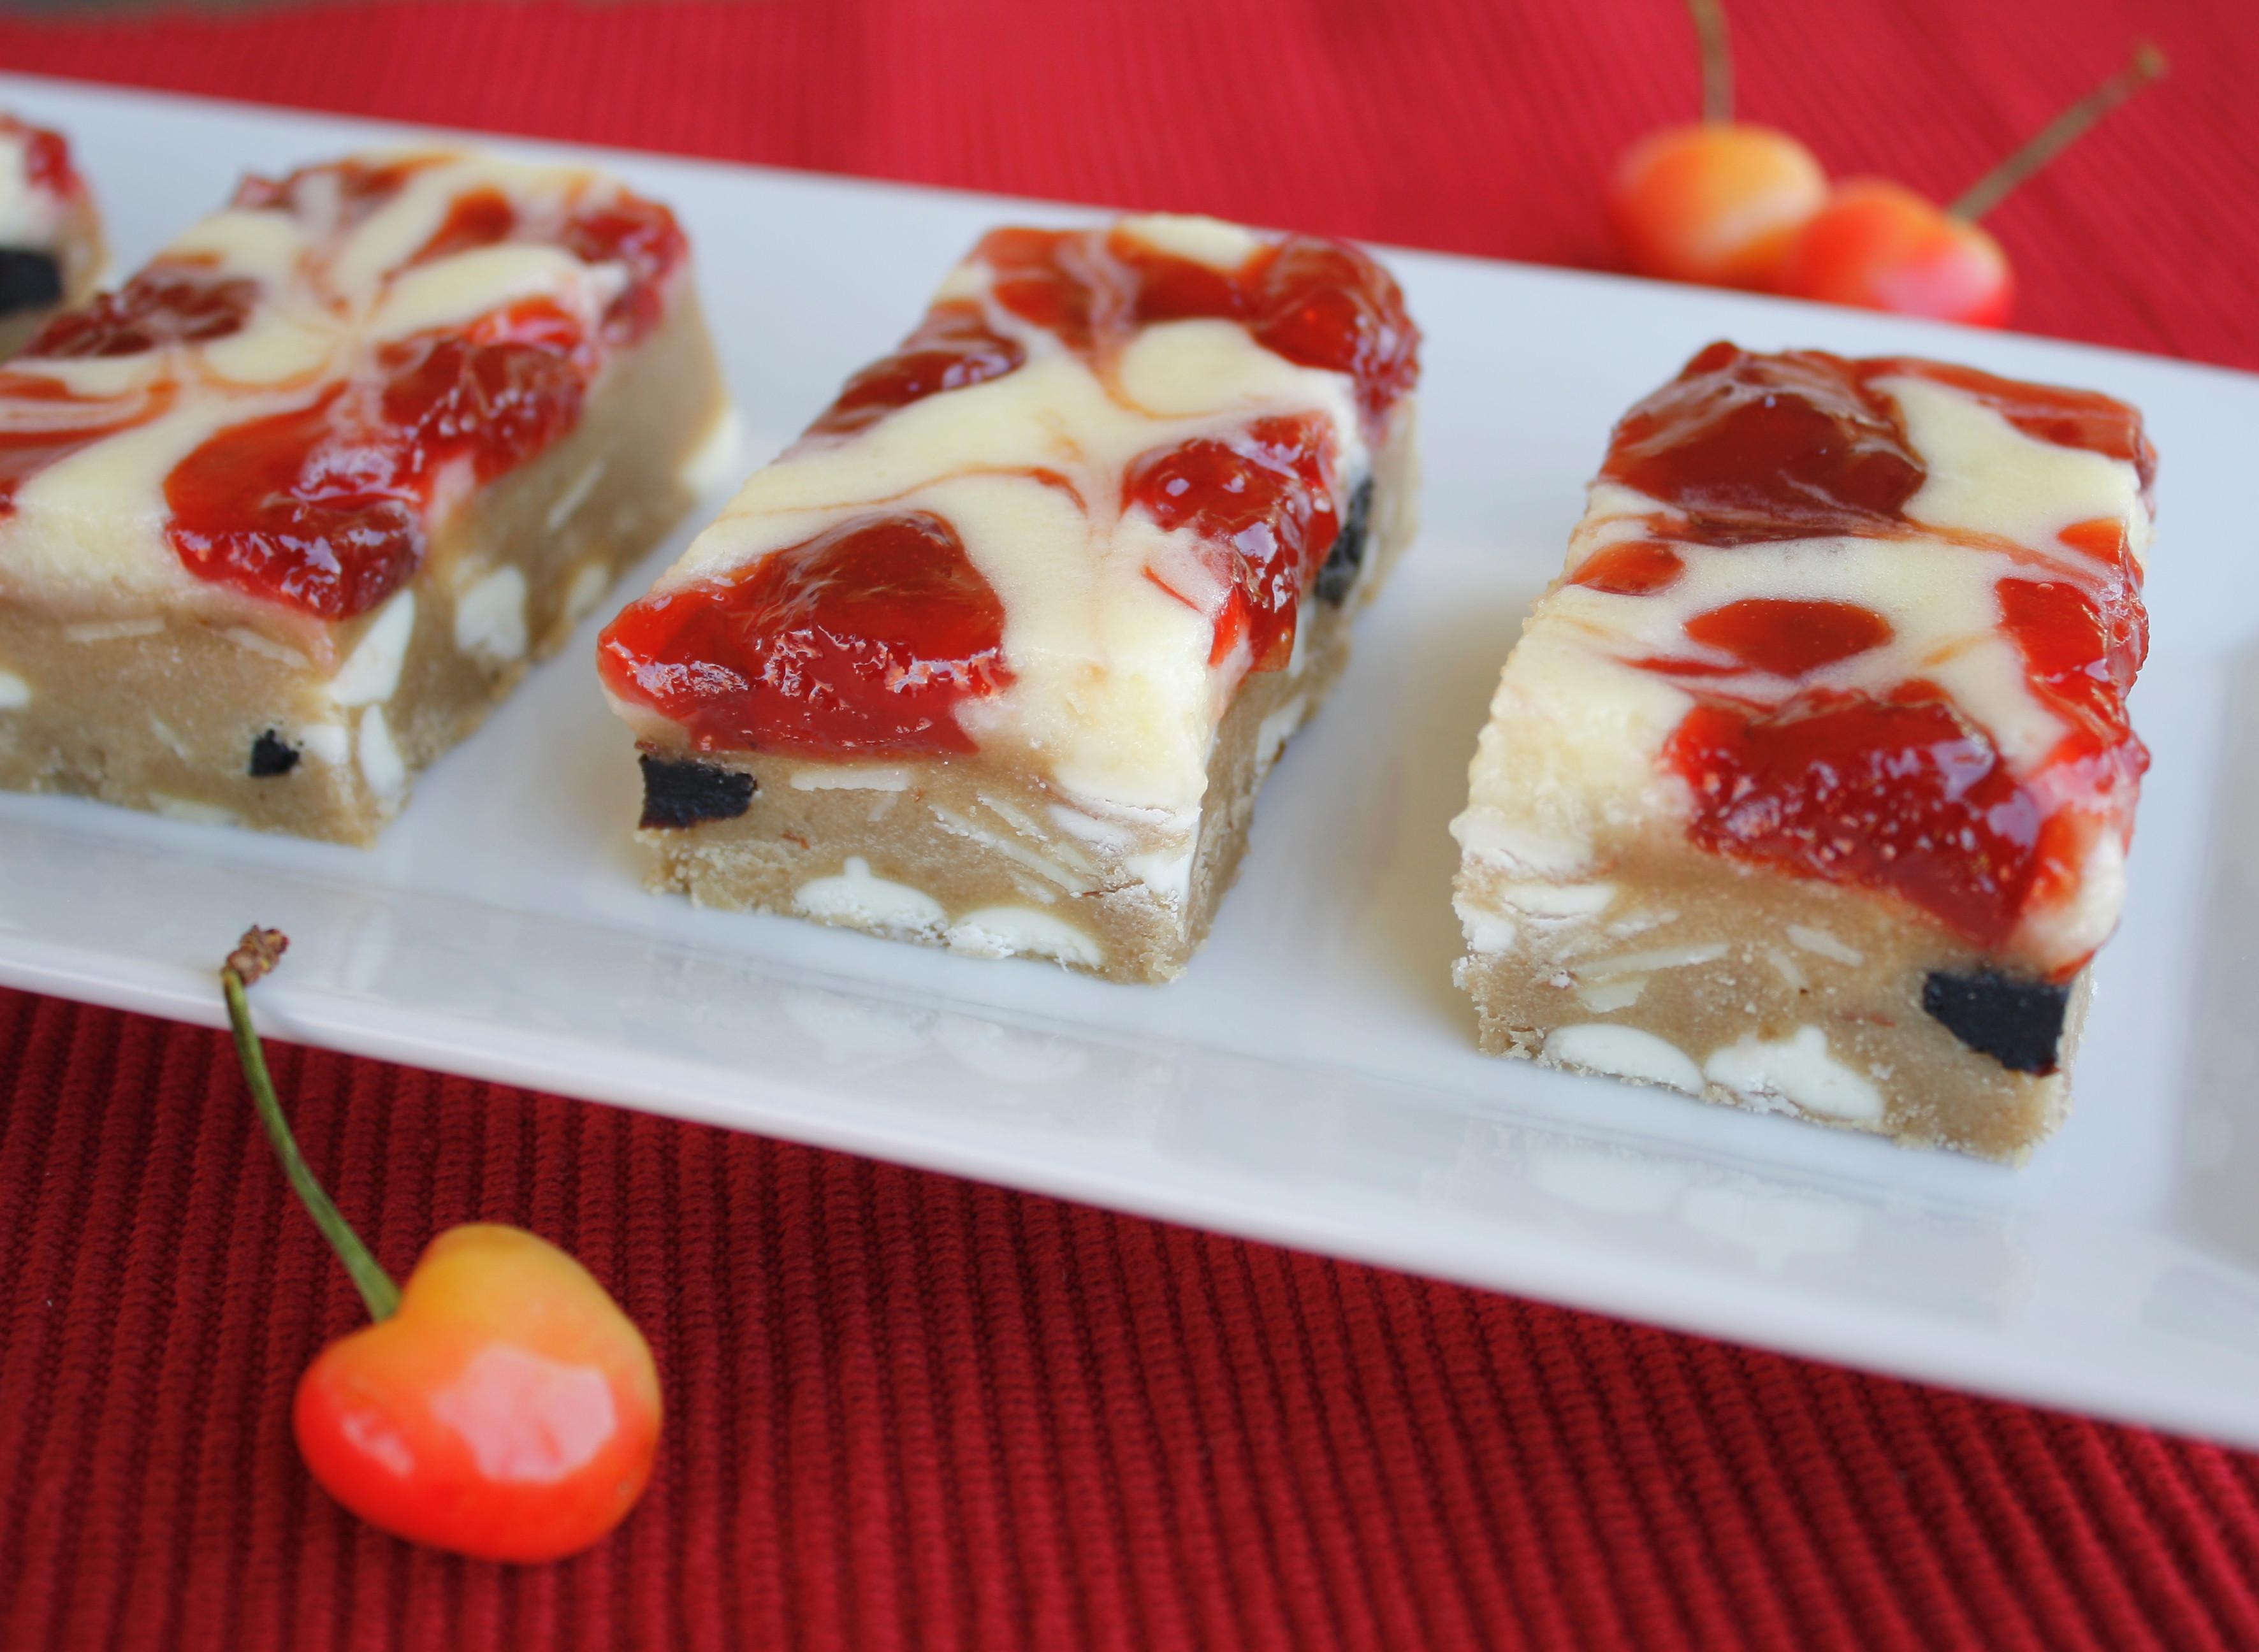 Memorial Day Dessert Recipe  Perfect Memorial Day Dessert – Cherry Almond White